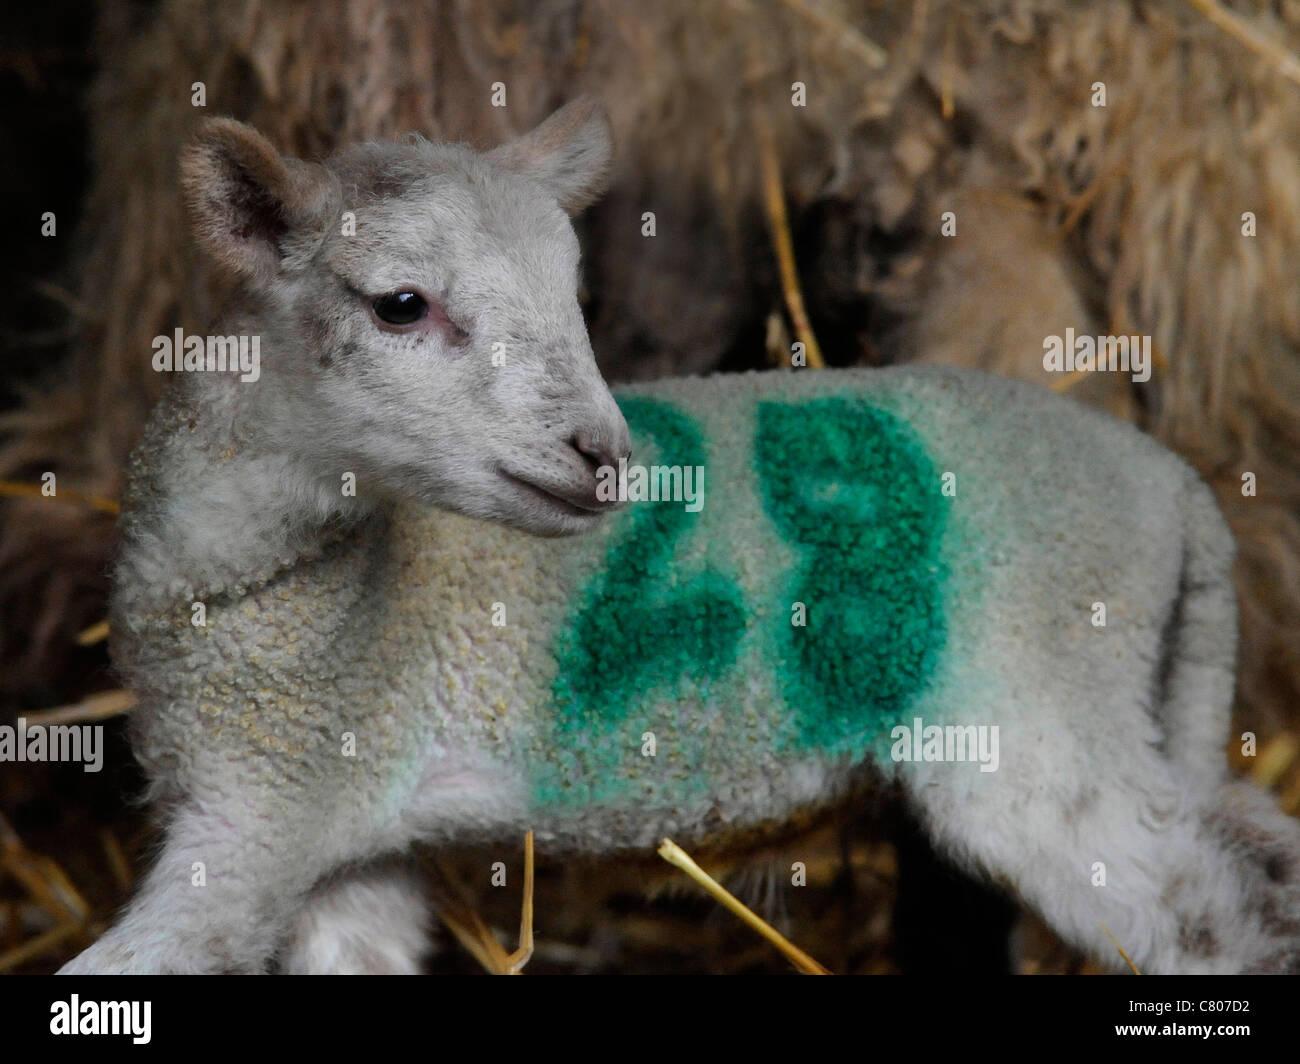 A small newborn lamb in a barn - Stock Image